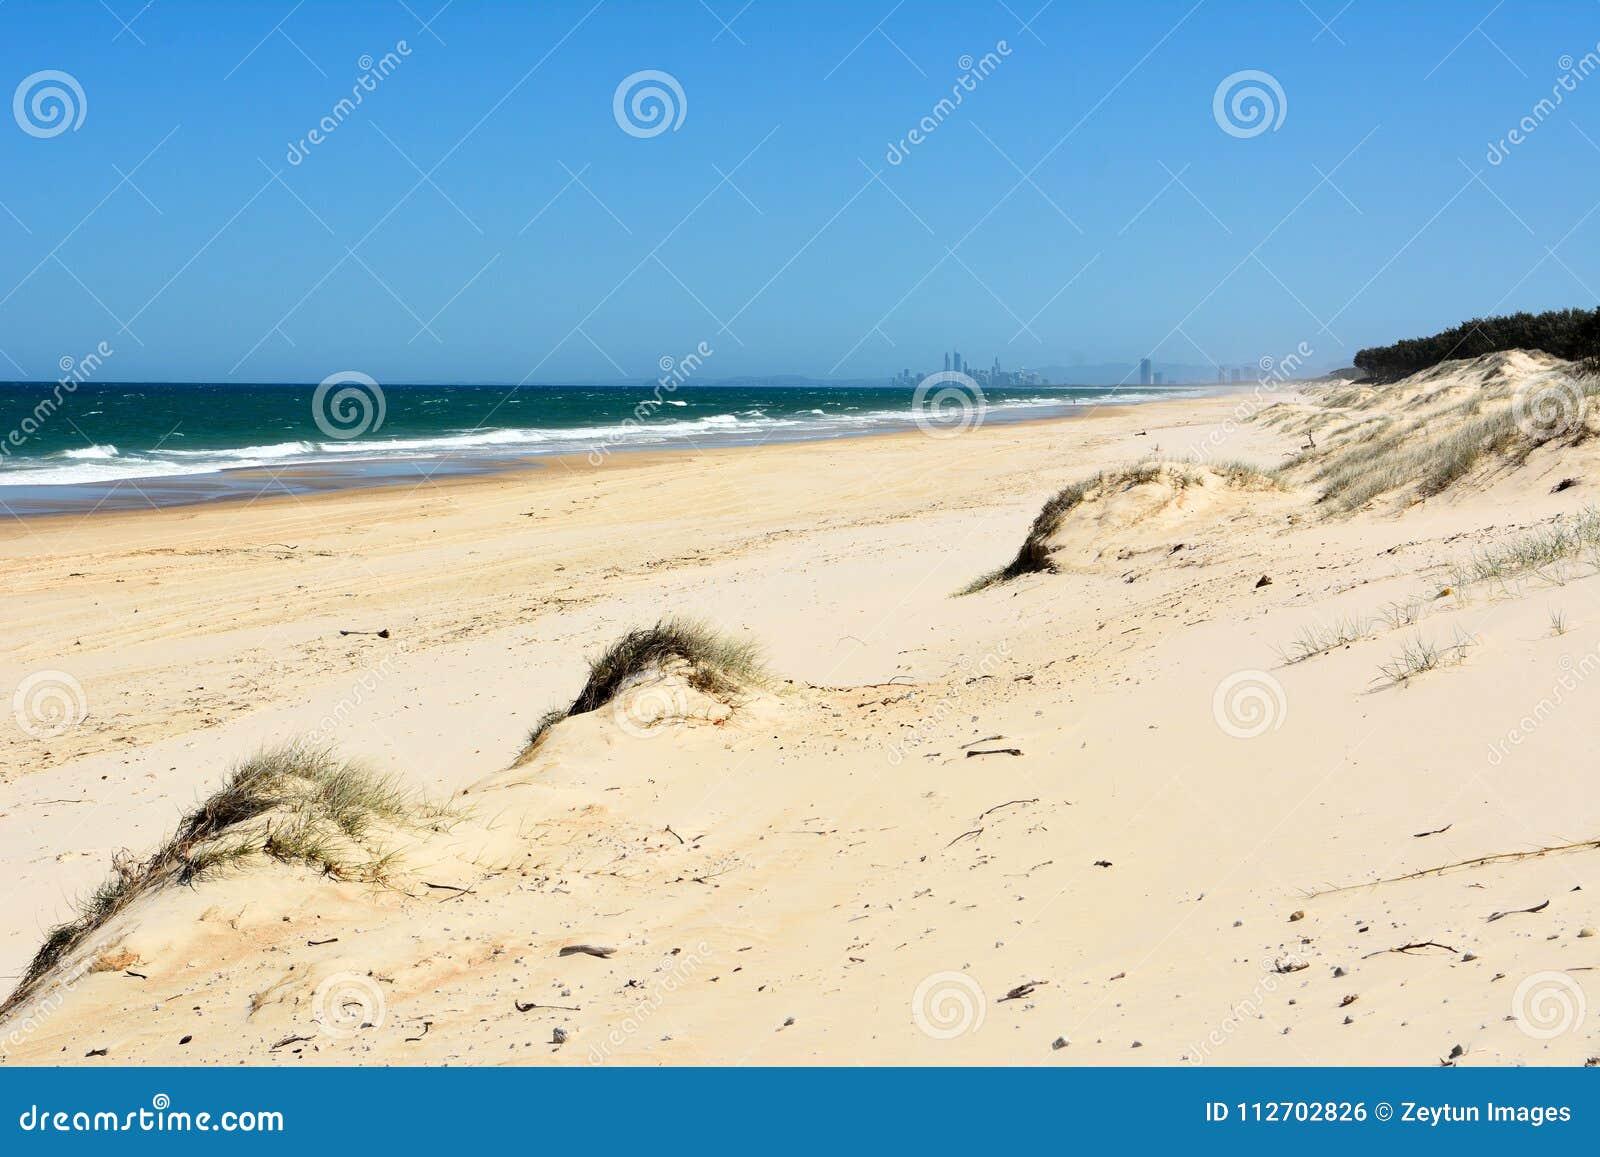 Sand Dunes And Surf Beach On South Stradbroke Island In